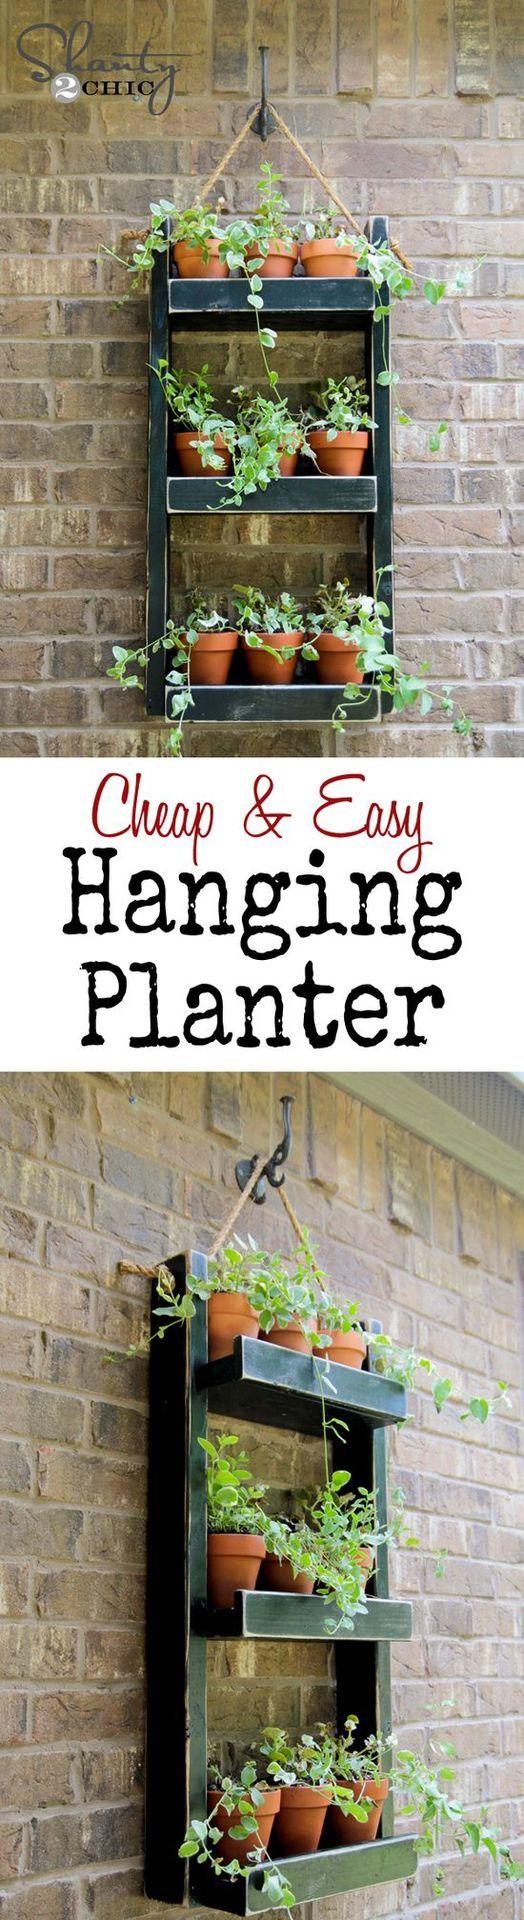 Super easy hanging planter